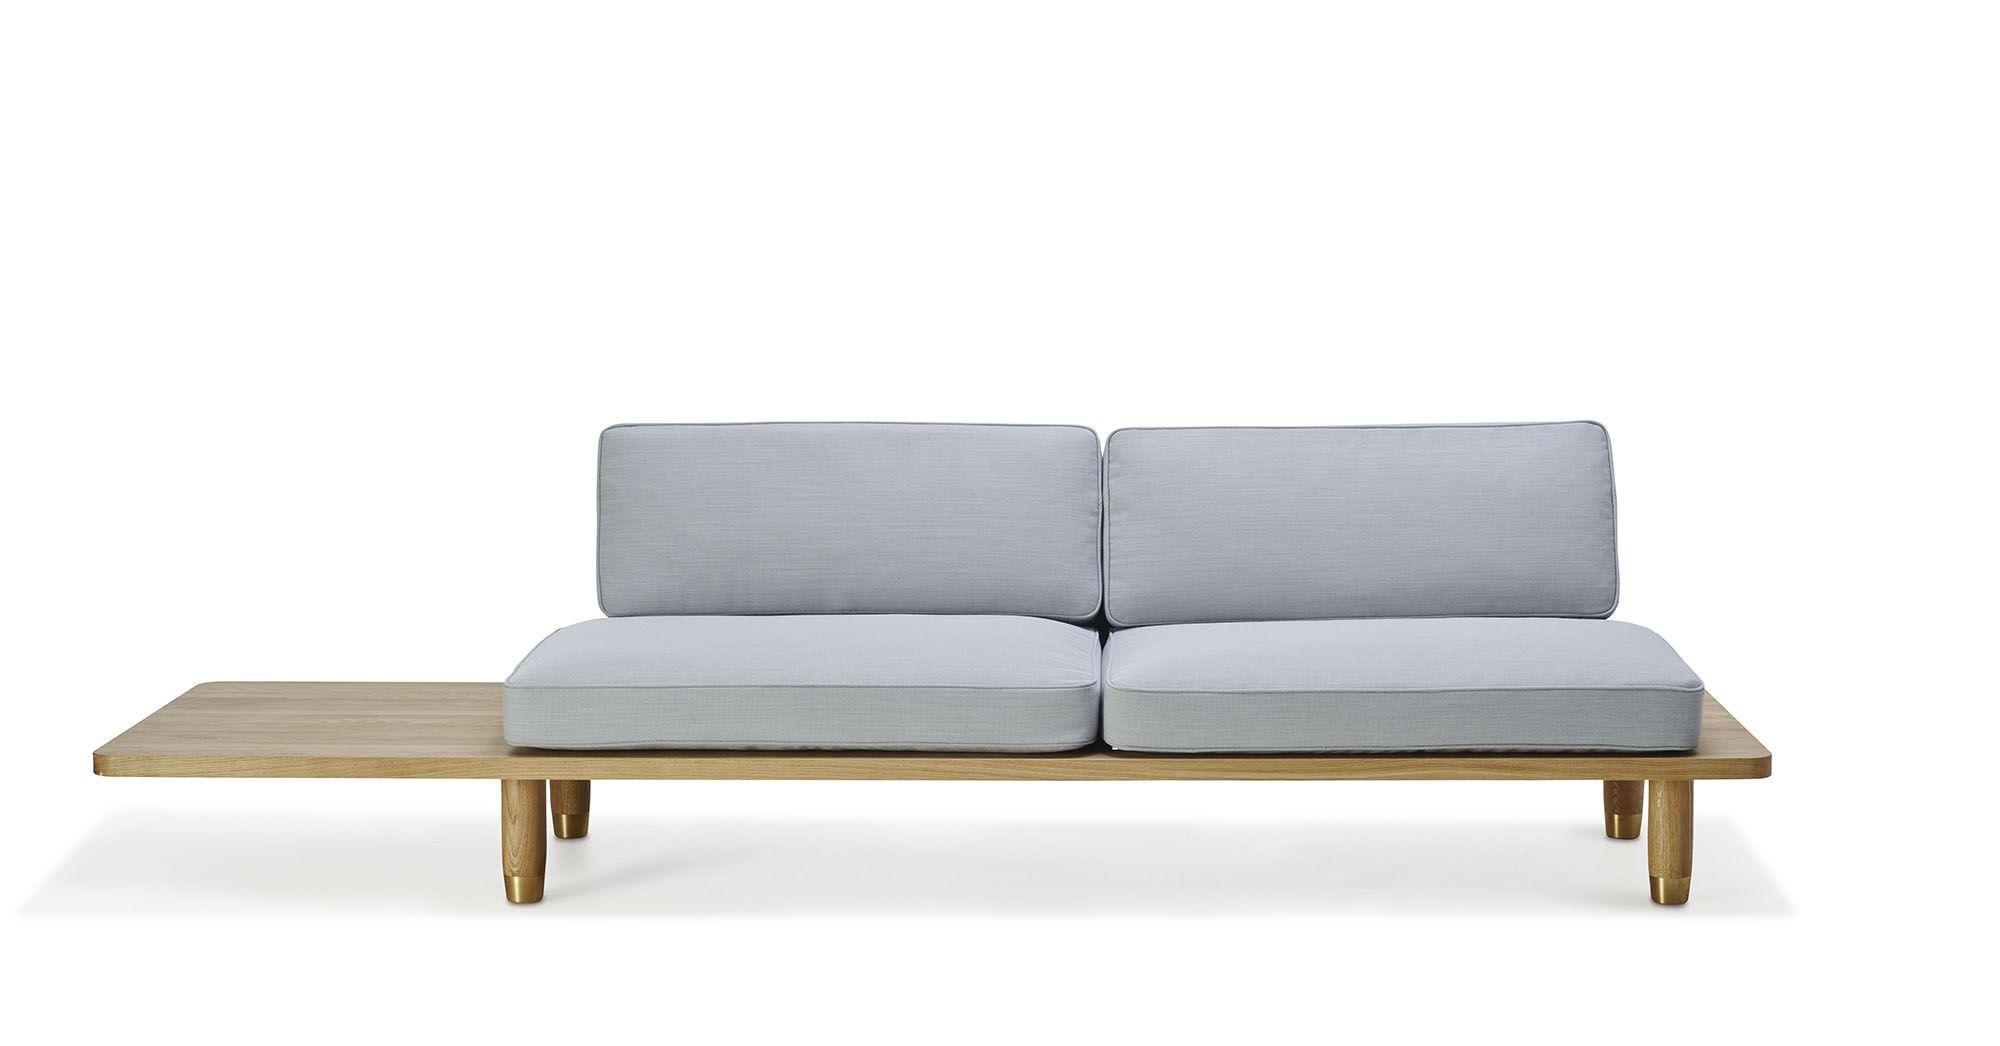 dk3 Plank Sofa 2013 Knudsen Berg Hindenes Myhr PlankSofa